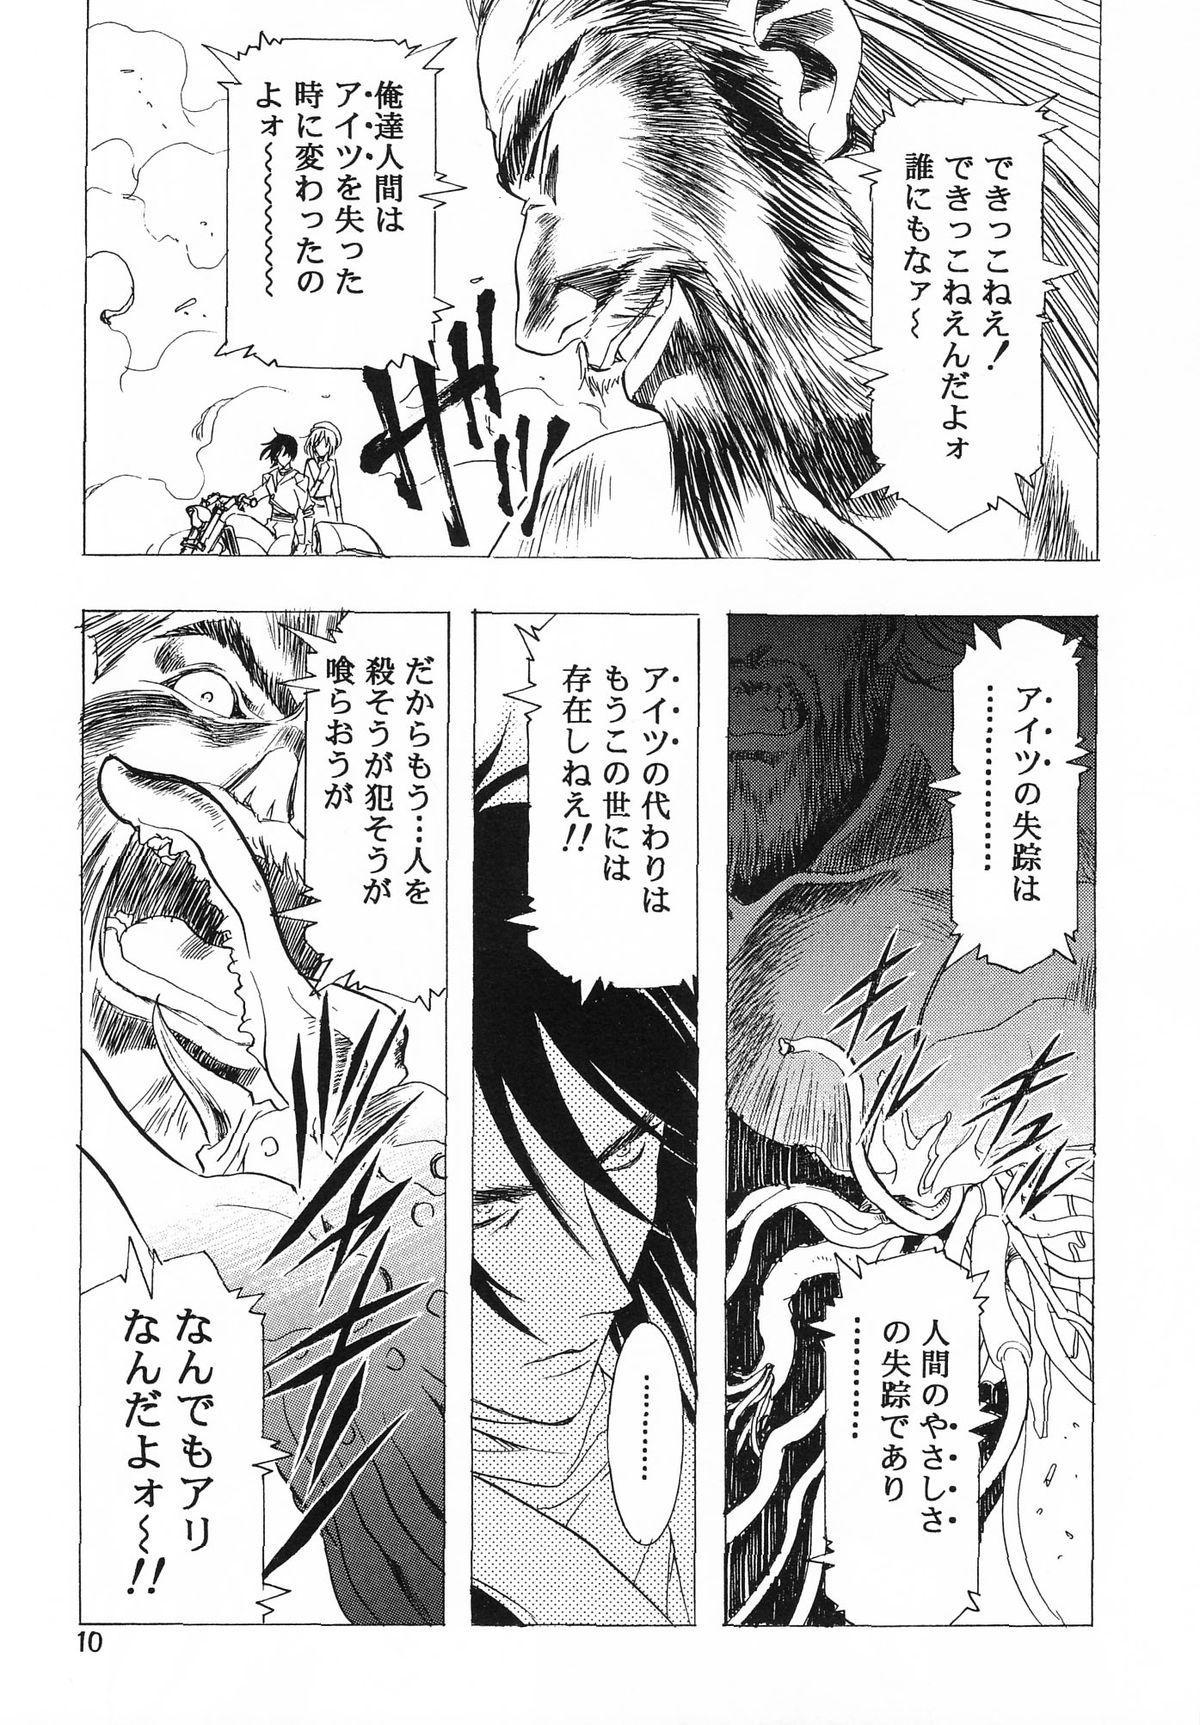 Henrei-kai '98 Natsu SPECIAL 11